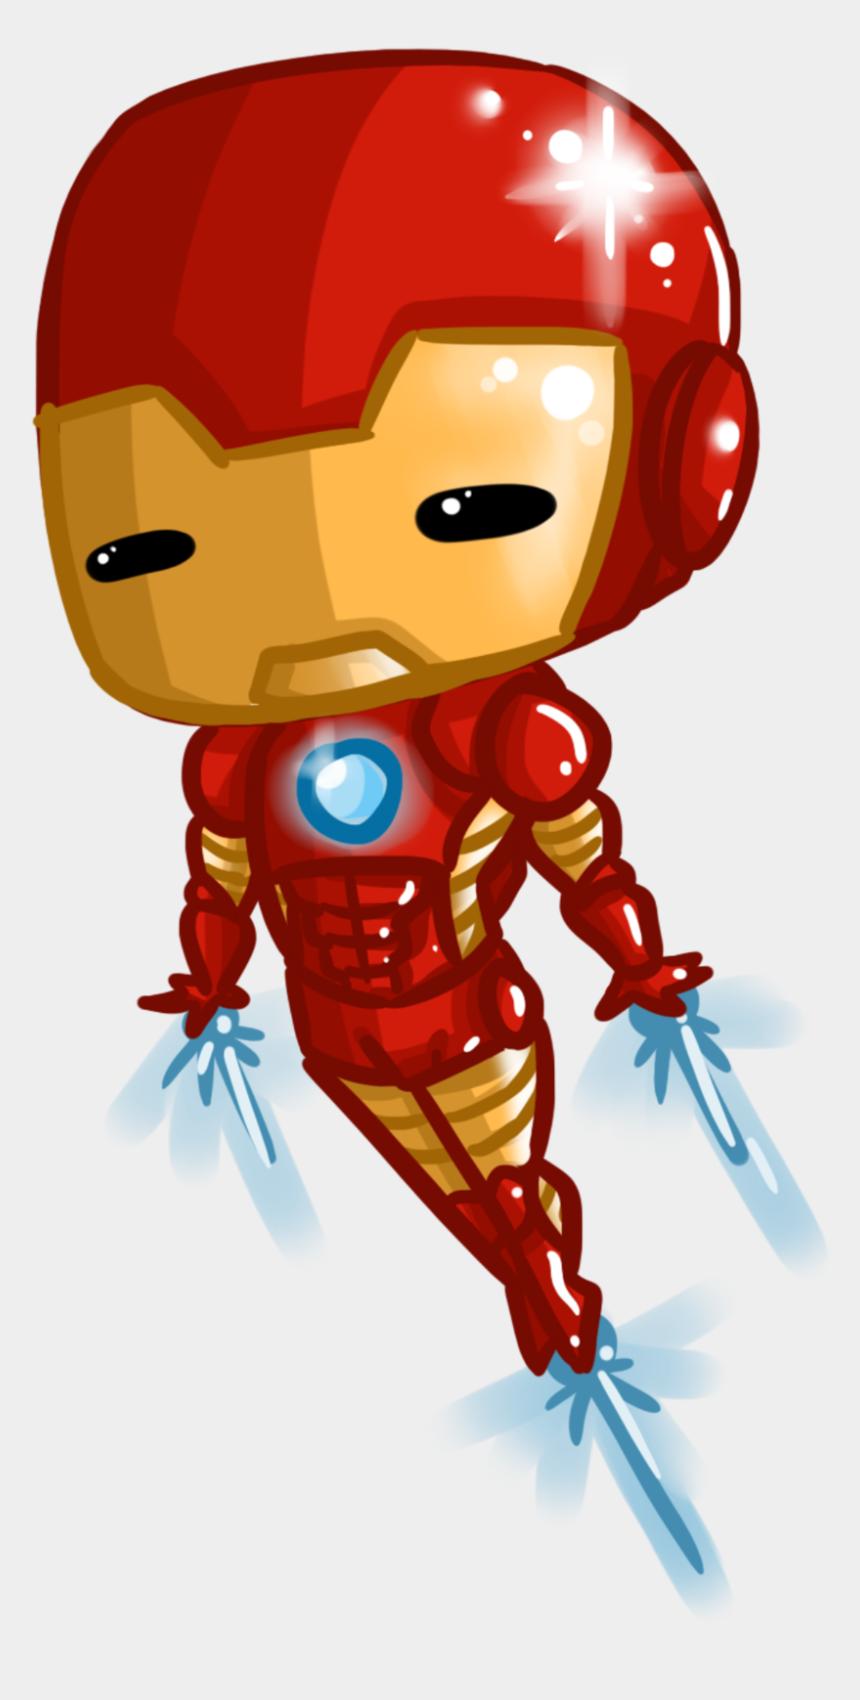 man clipart, Cartoons - Iron Man Tony Stark Clipart Clipartfox - Iron Man Chibi Png